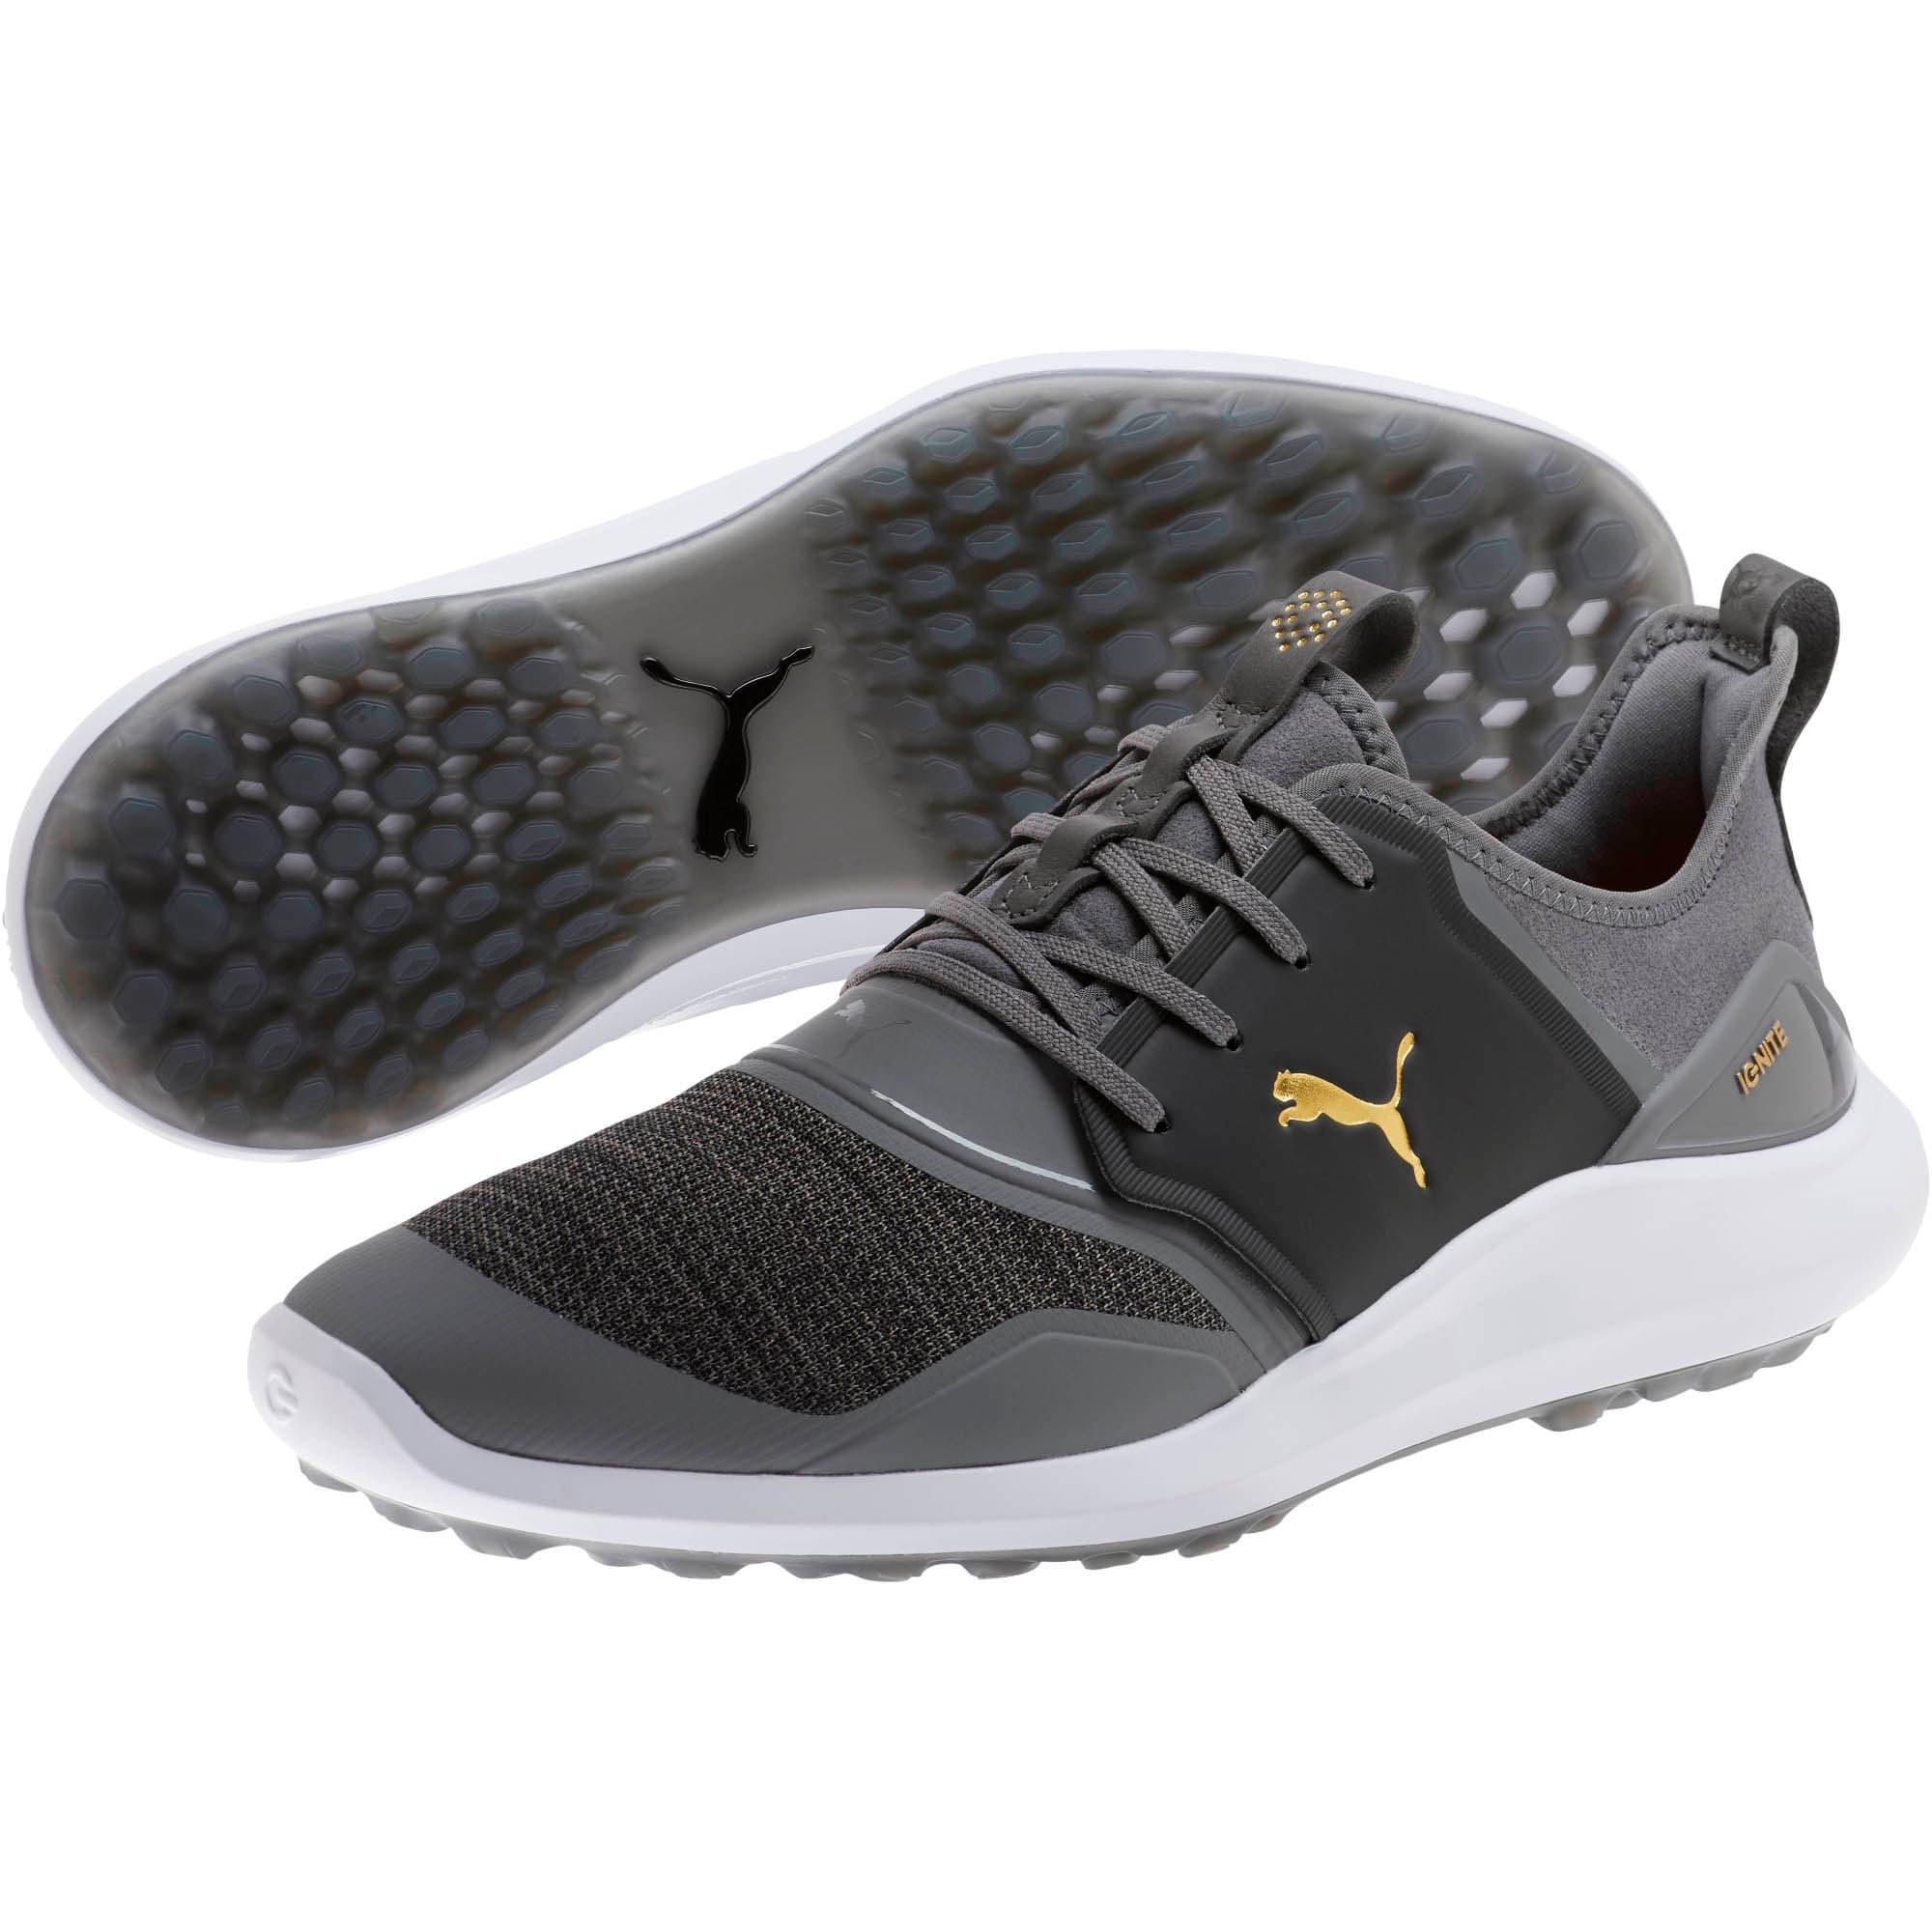 Thumbnail 2 of IGNITE NXT Men's Golf Shoes, QUIET SHADE-Gold-Black, medium